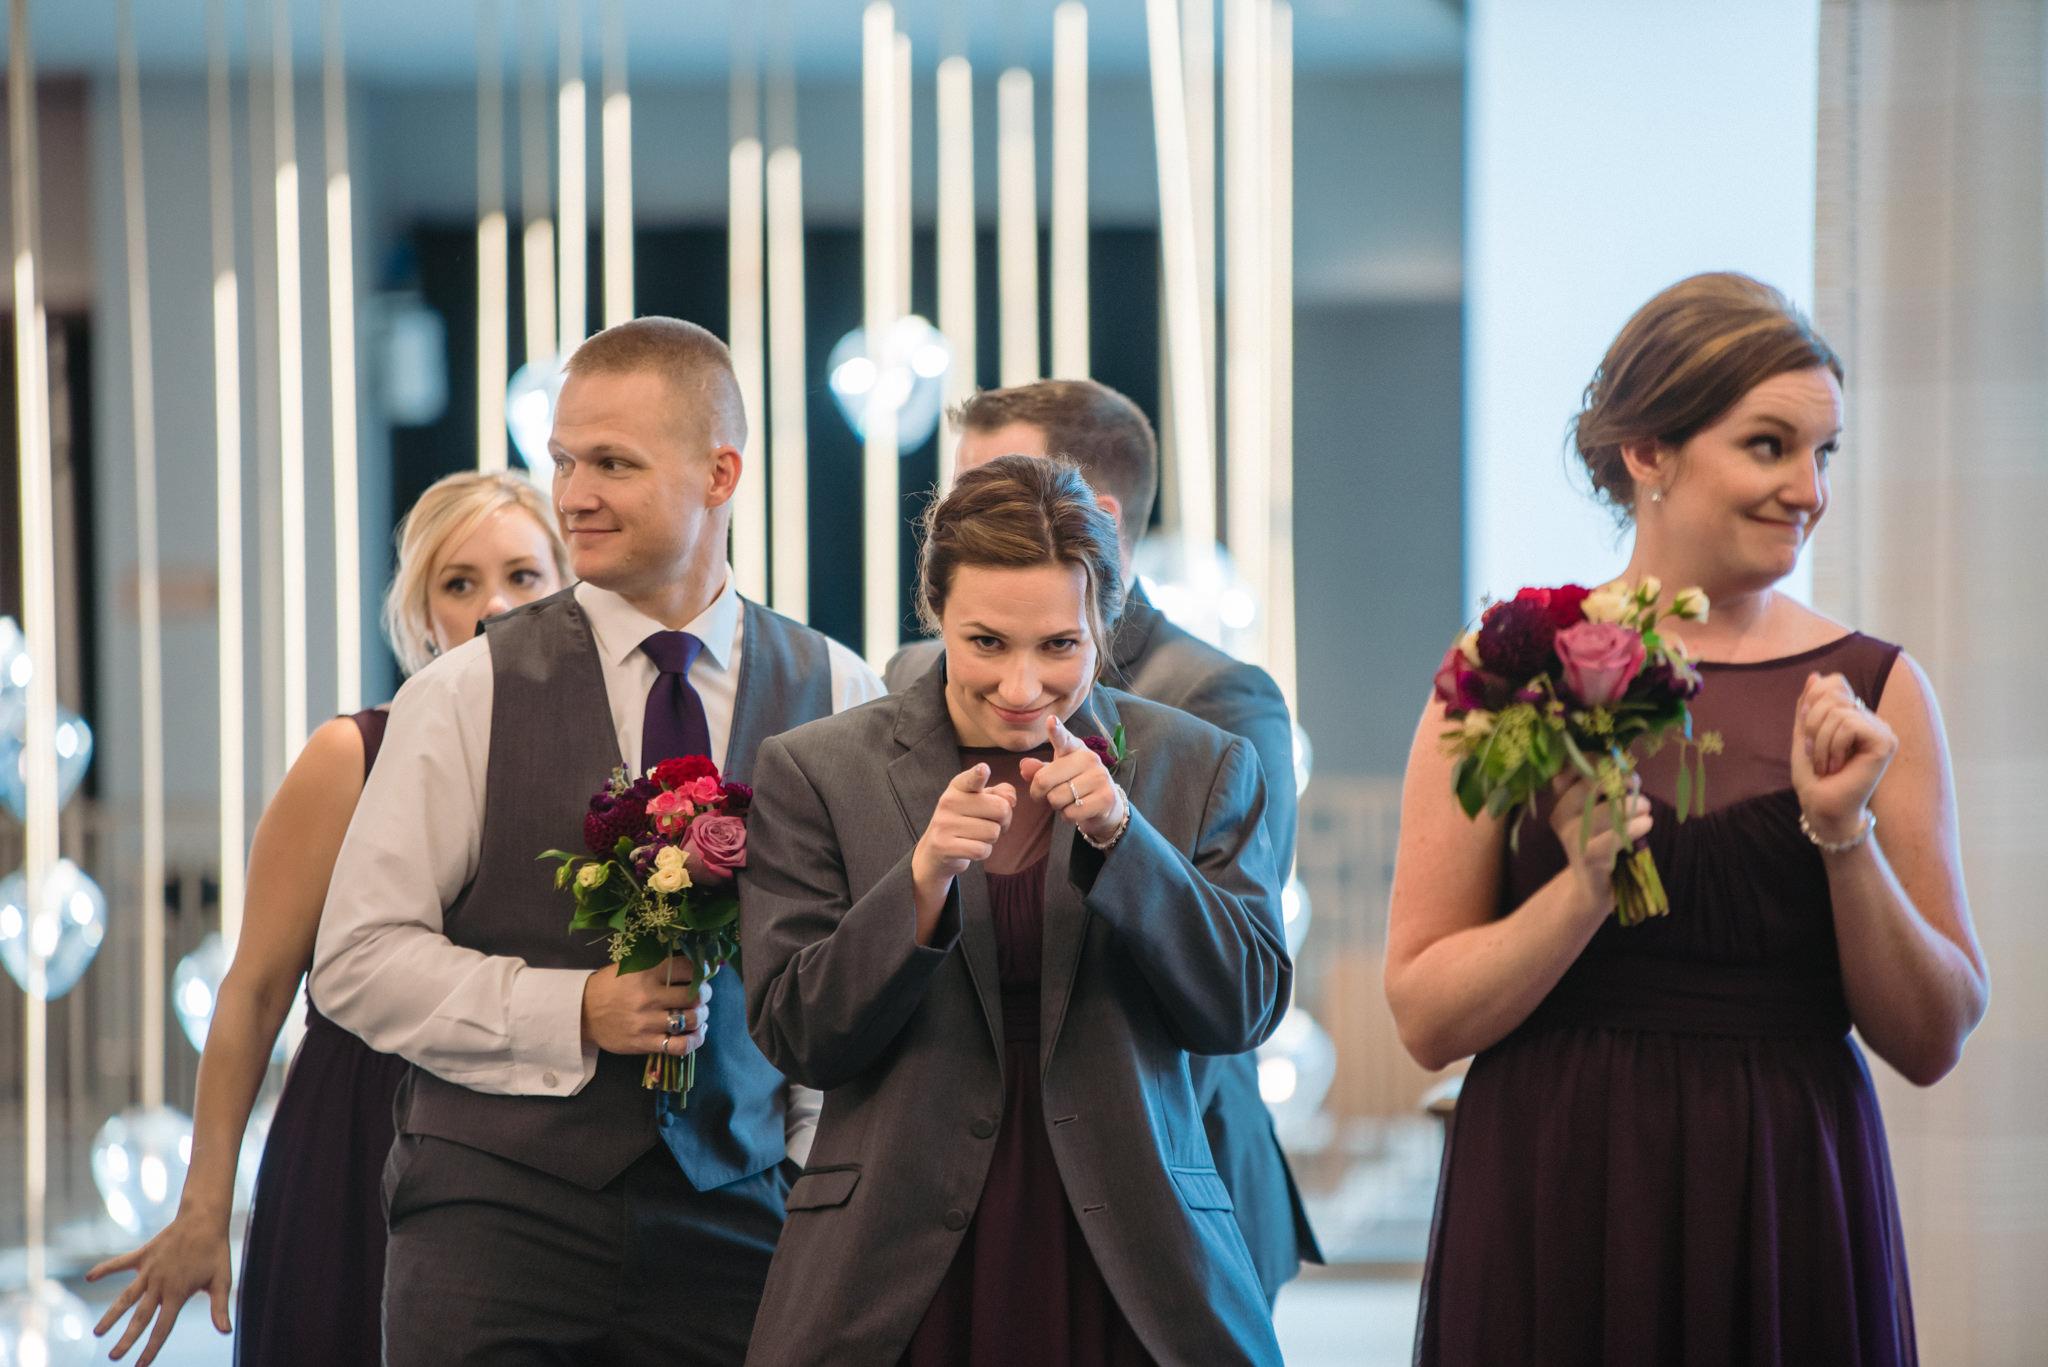 OMAHA-MARRIOTT-WEDDING-DOWNTOWN-MARRIOTT-OMAHA-WEDDING-PHOTOGRAPHER-JM-STUDIOS-035.jpg